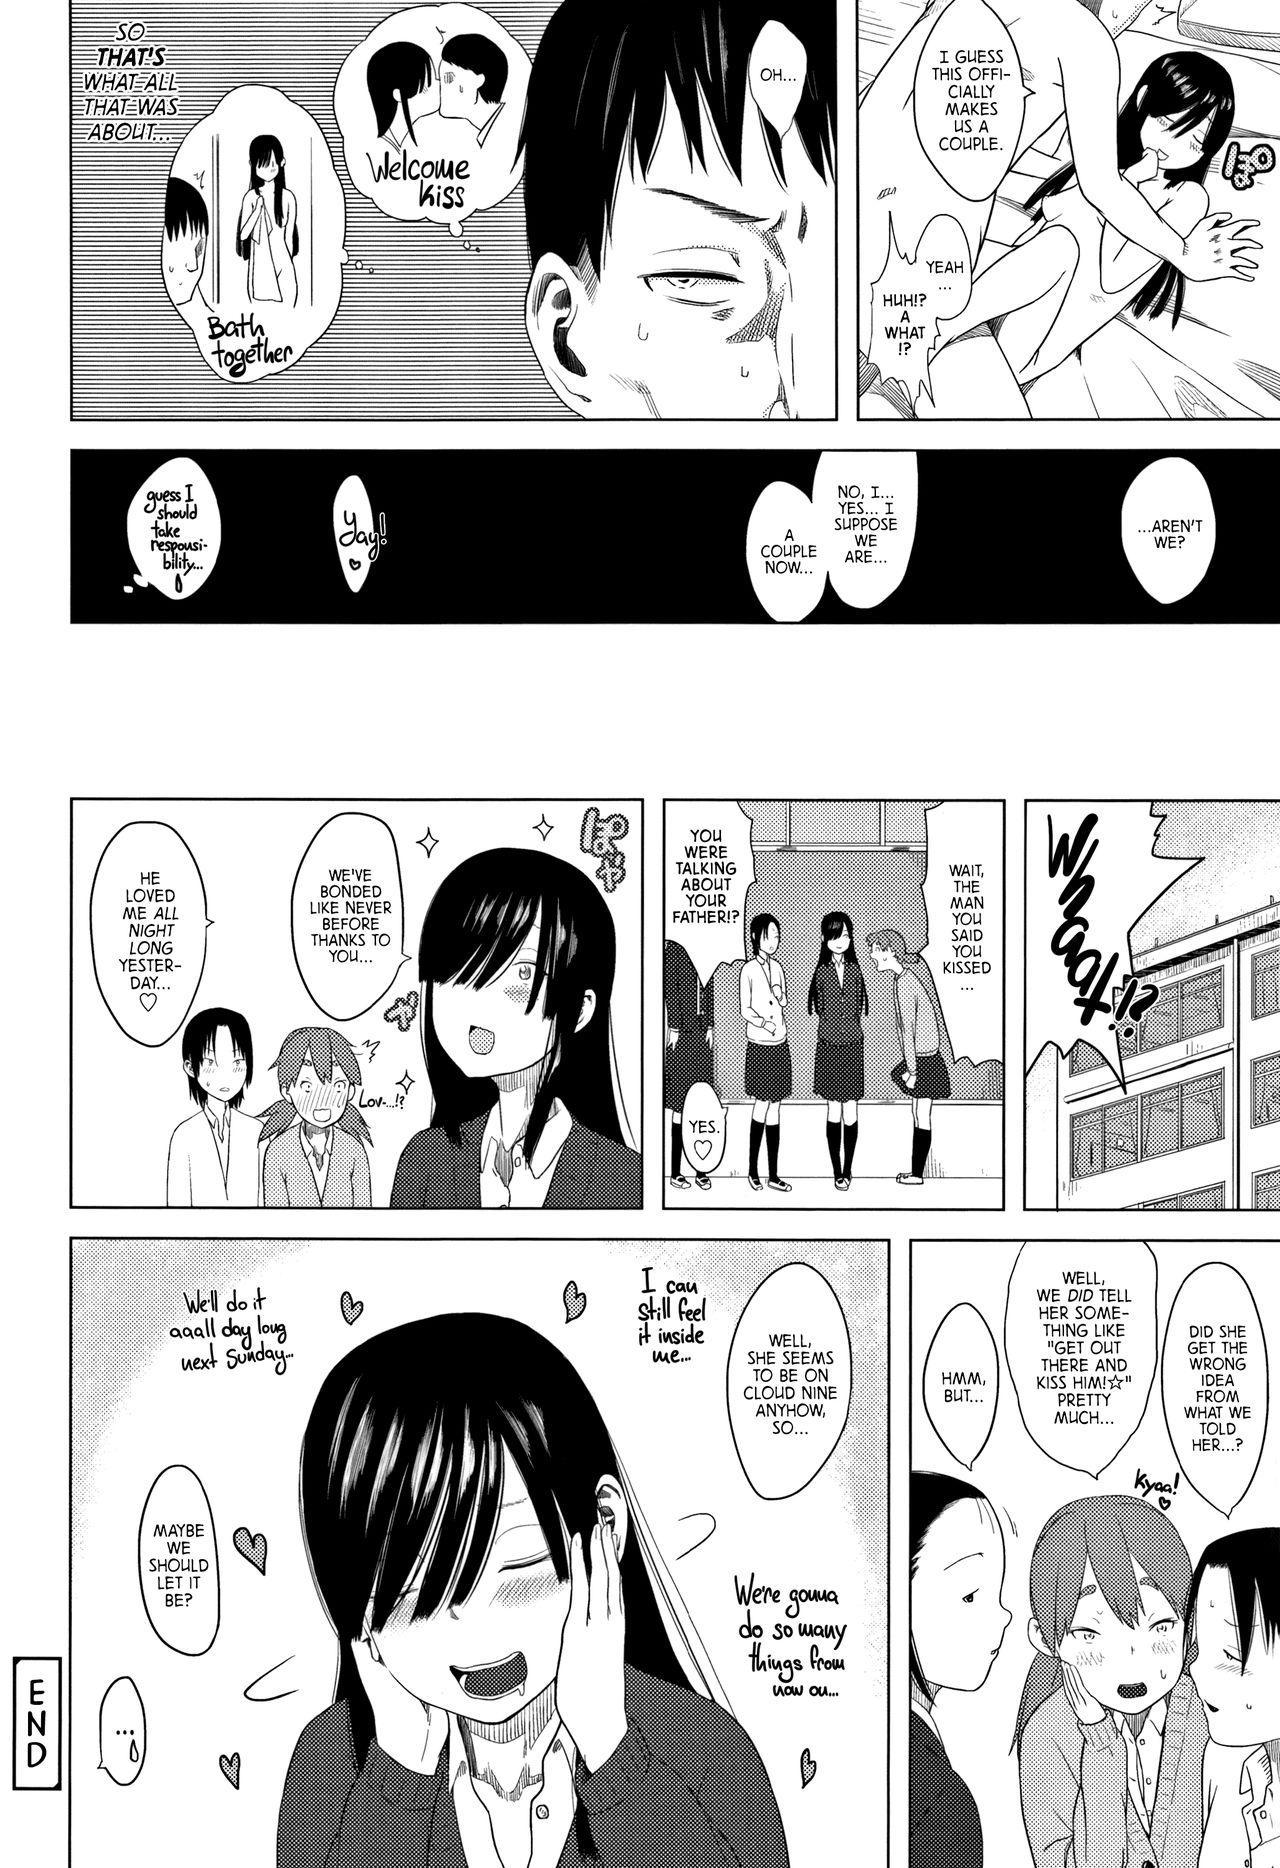 Chichi to Musume no Seiai Hakusho | Father and daughter sex white paper 73